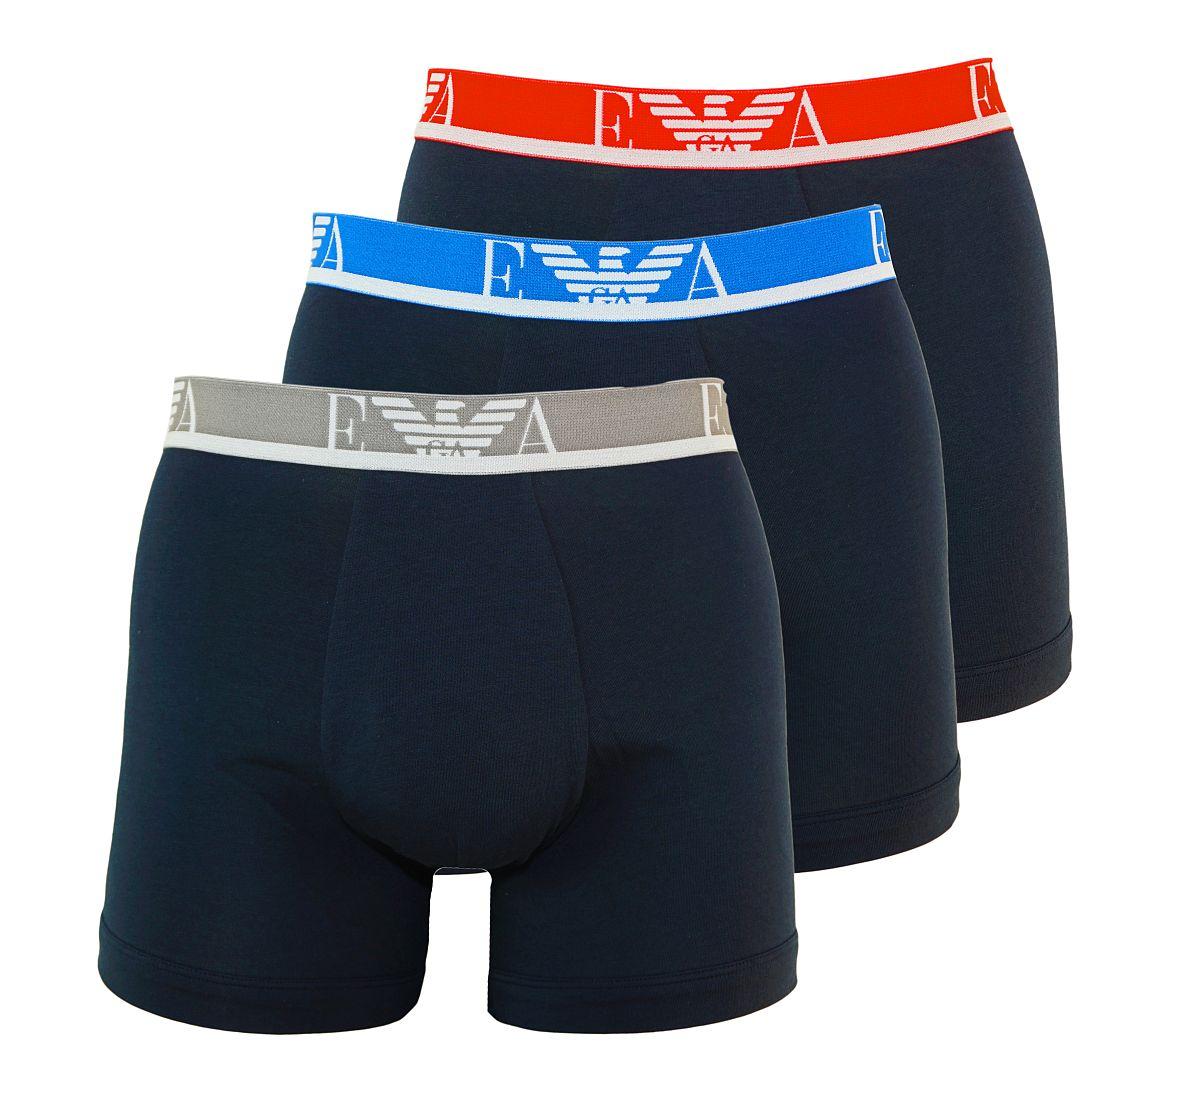 Emporio Armani 3er Pack Boxershorts Unterhosen Marine 111473 7P715 40035 WF17-EAB1